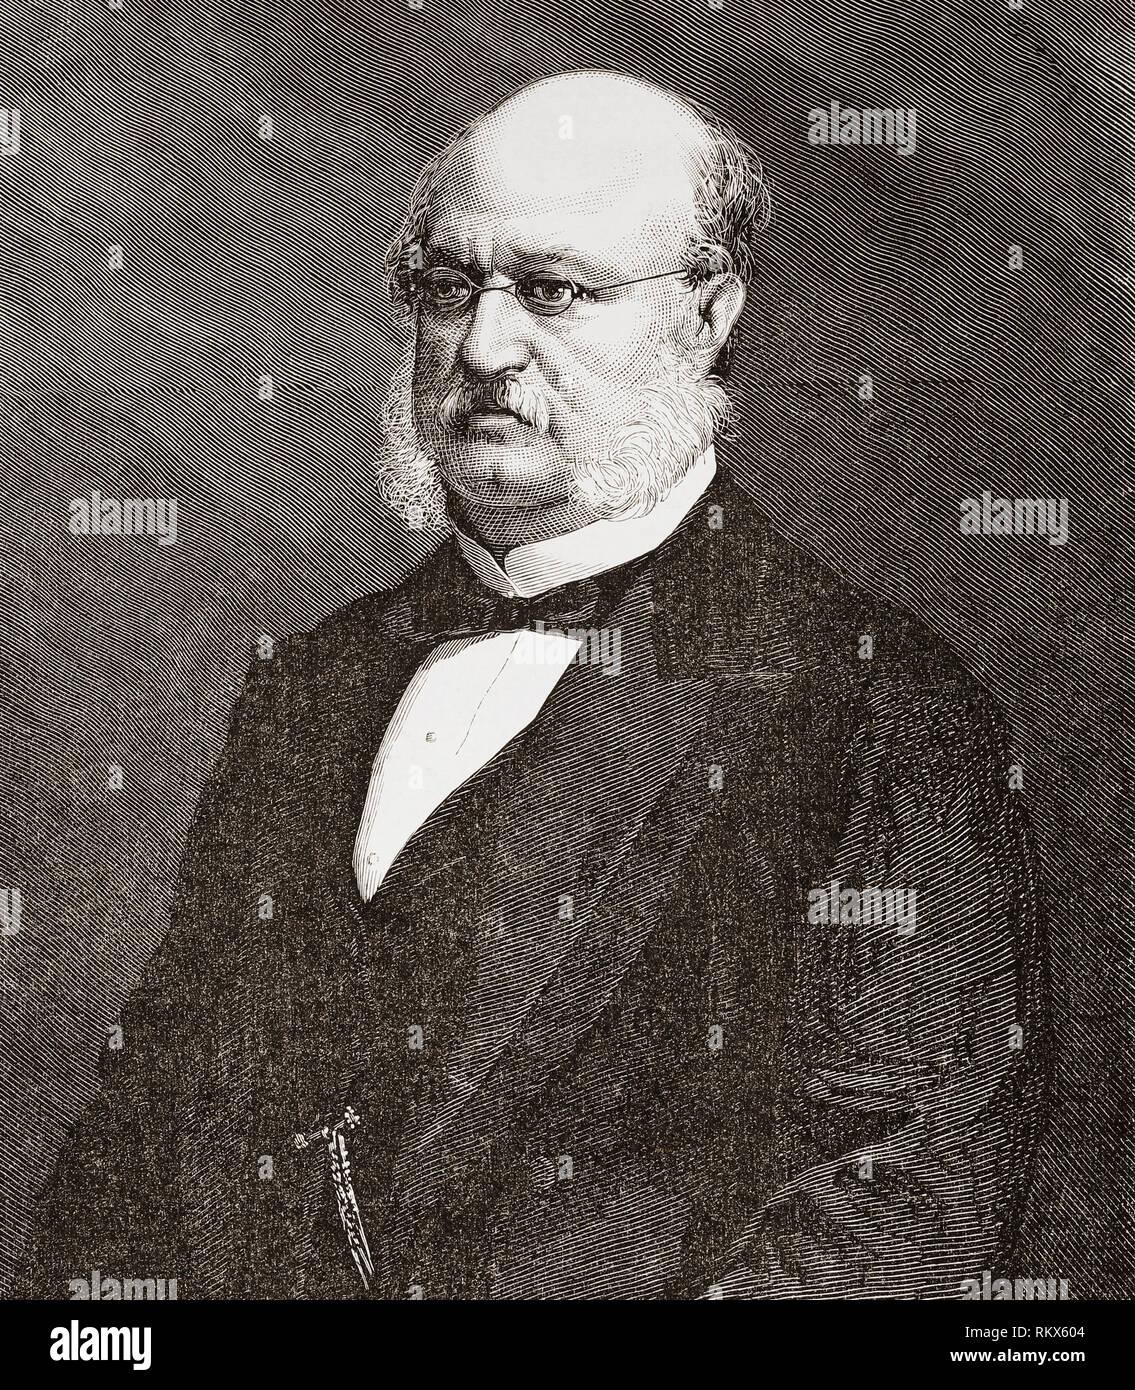 Manuel Garcia Barzanallana Garcia-Frias, 1817 -1892.  Spanish politician and government official.  From La Ilustracion Espanola y Americana, published 1892. - Stock Image